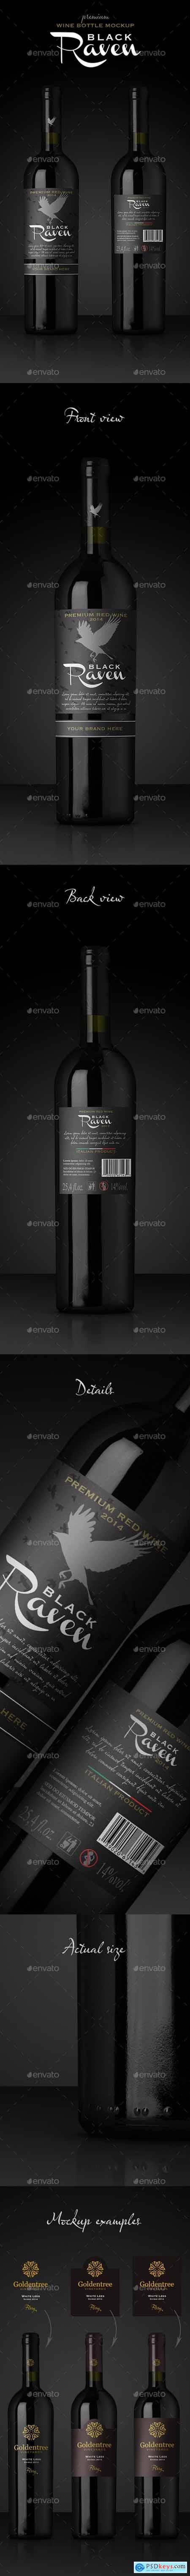 Premium Red Wine Mockup 6711653